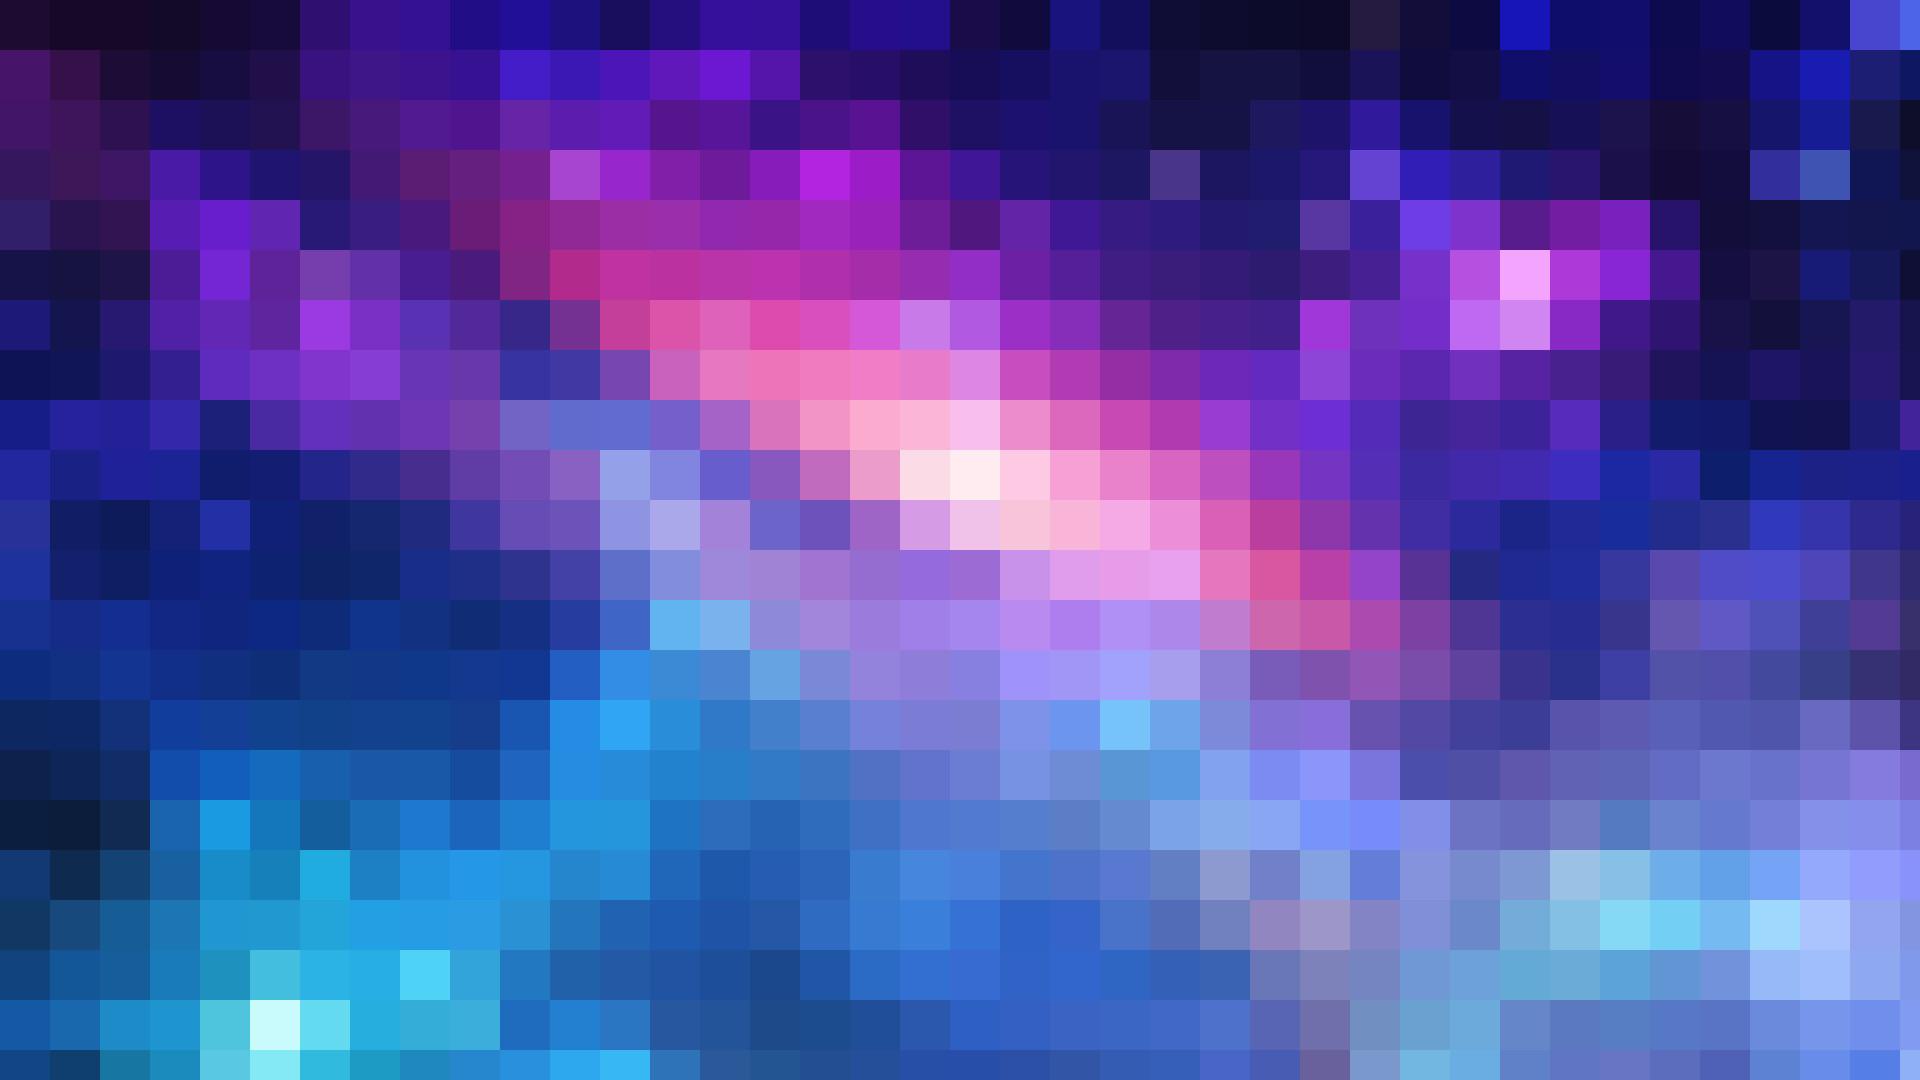 Art Artwork Geek Minimal Nerd Pixel Retro Games Space